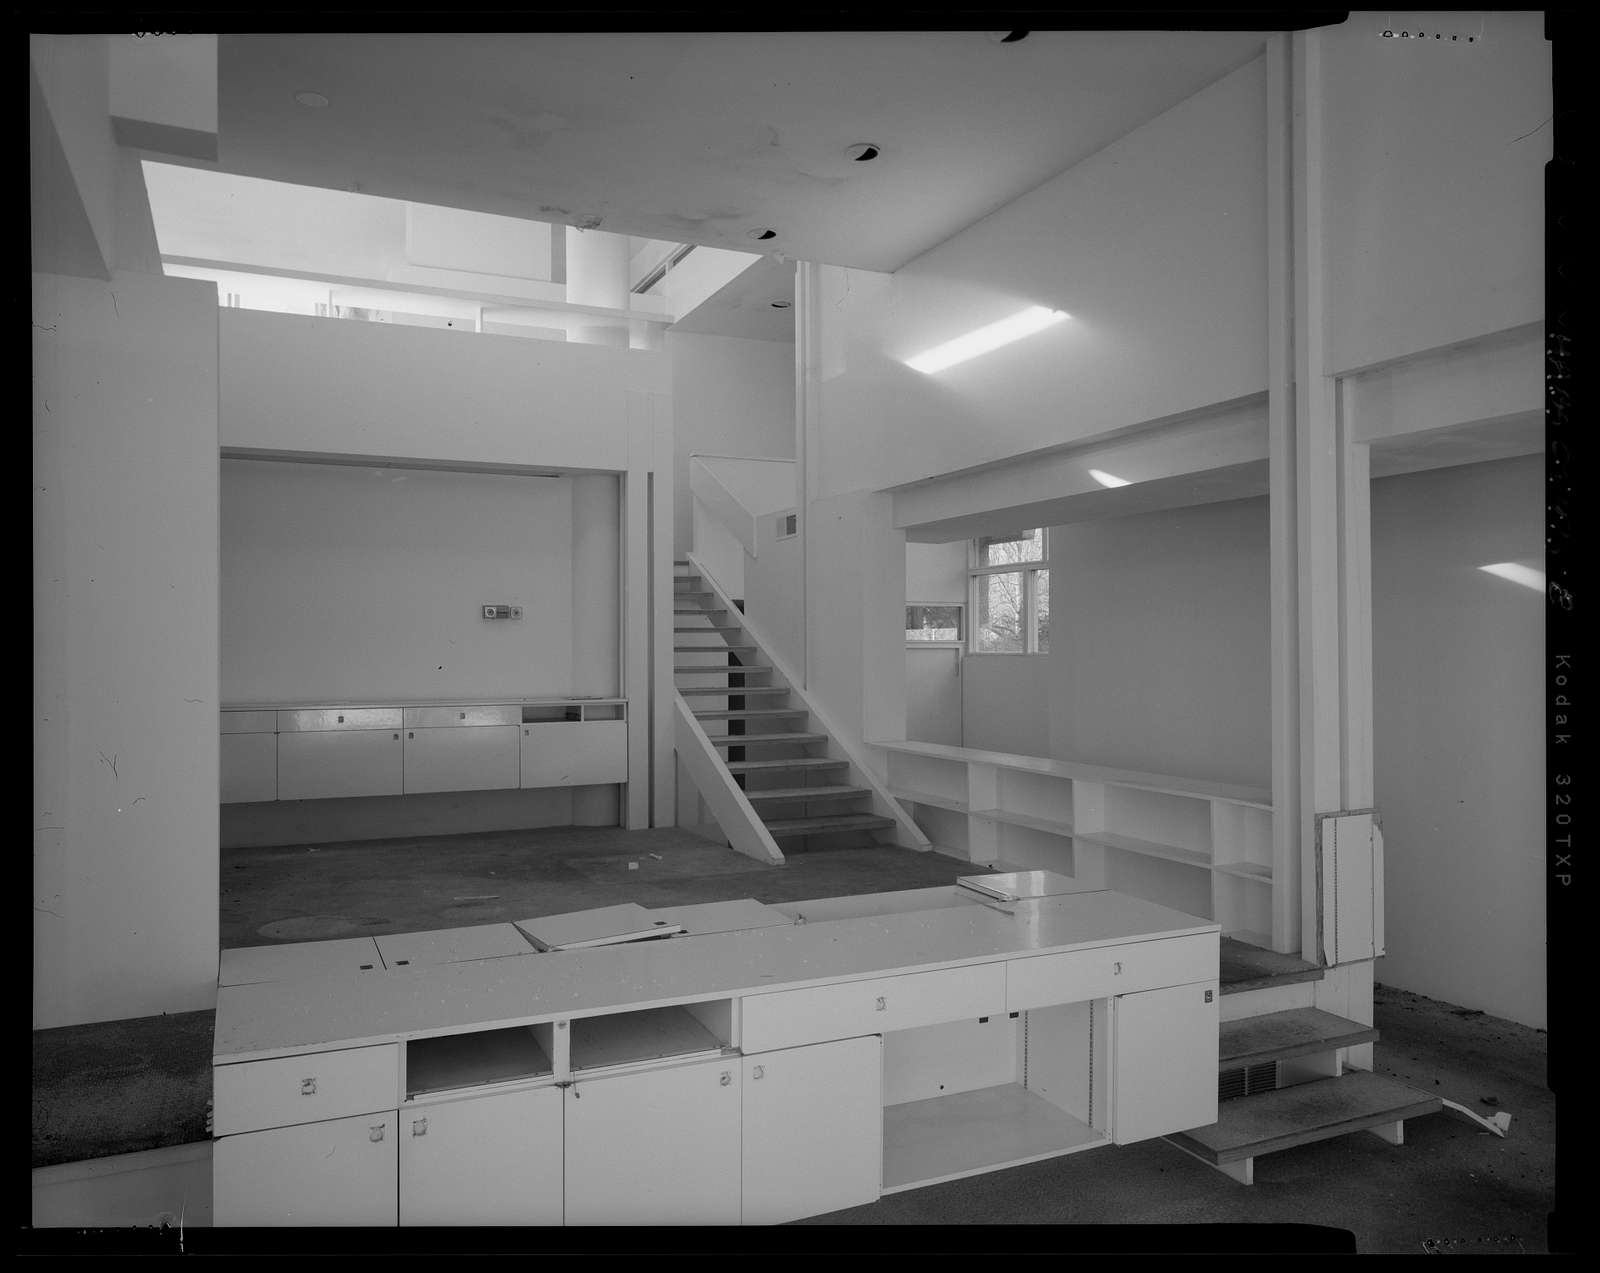 Paul Rudolph's Louis Micheels House, 16 Minute Man Hill, Westport, Fairfield County, CT